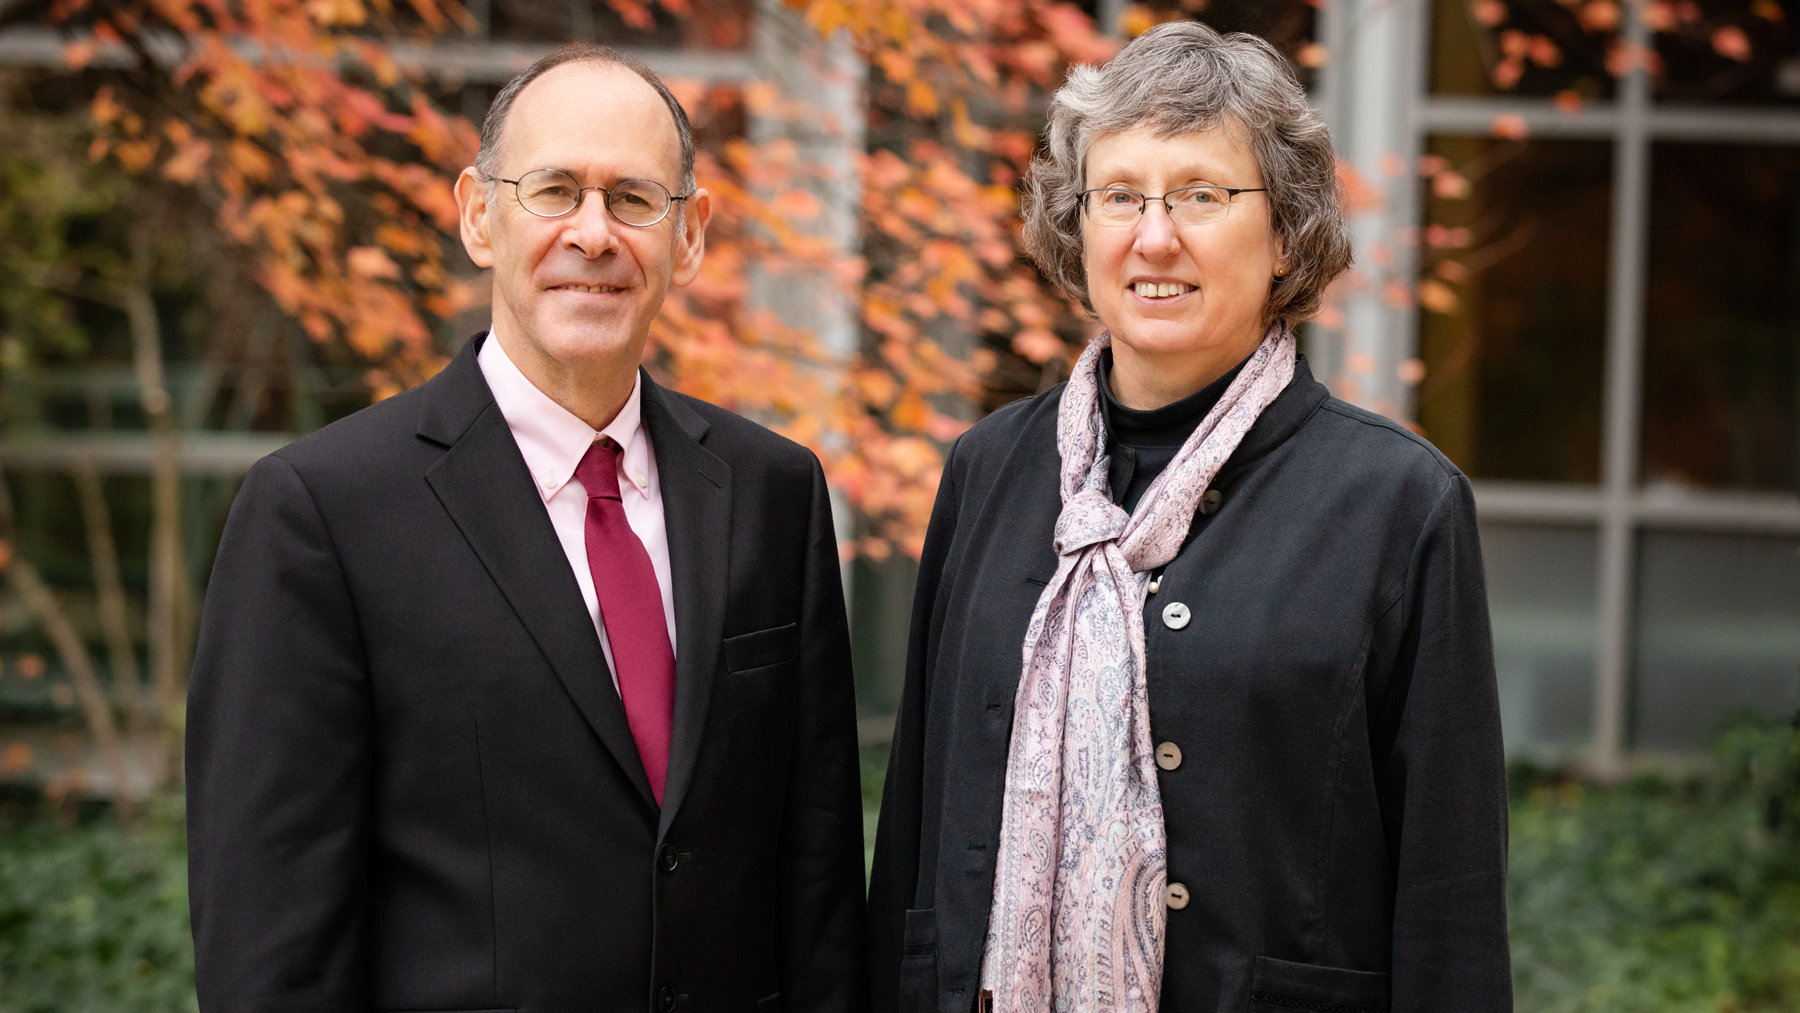 computer science professor Sheldon H. Jacobson and internal medicine professor Janet Jokela.  Photo by L. Brian Stauffer